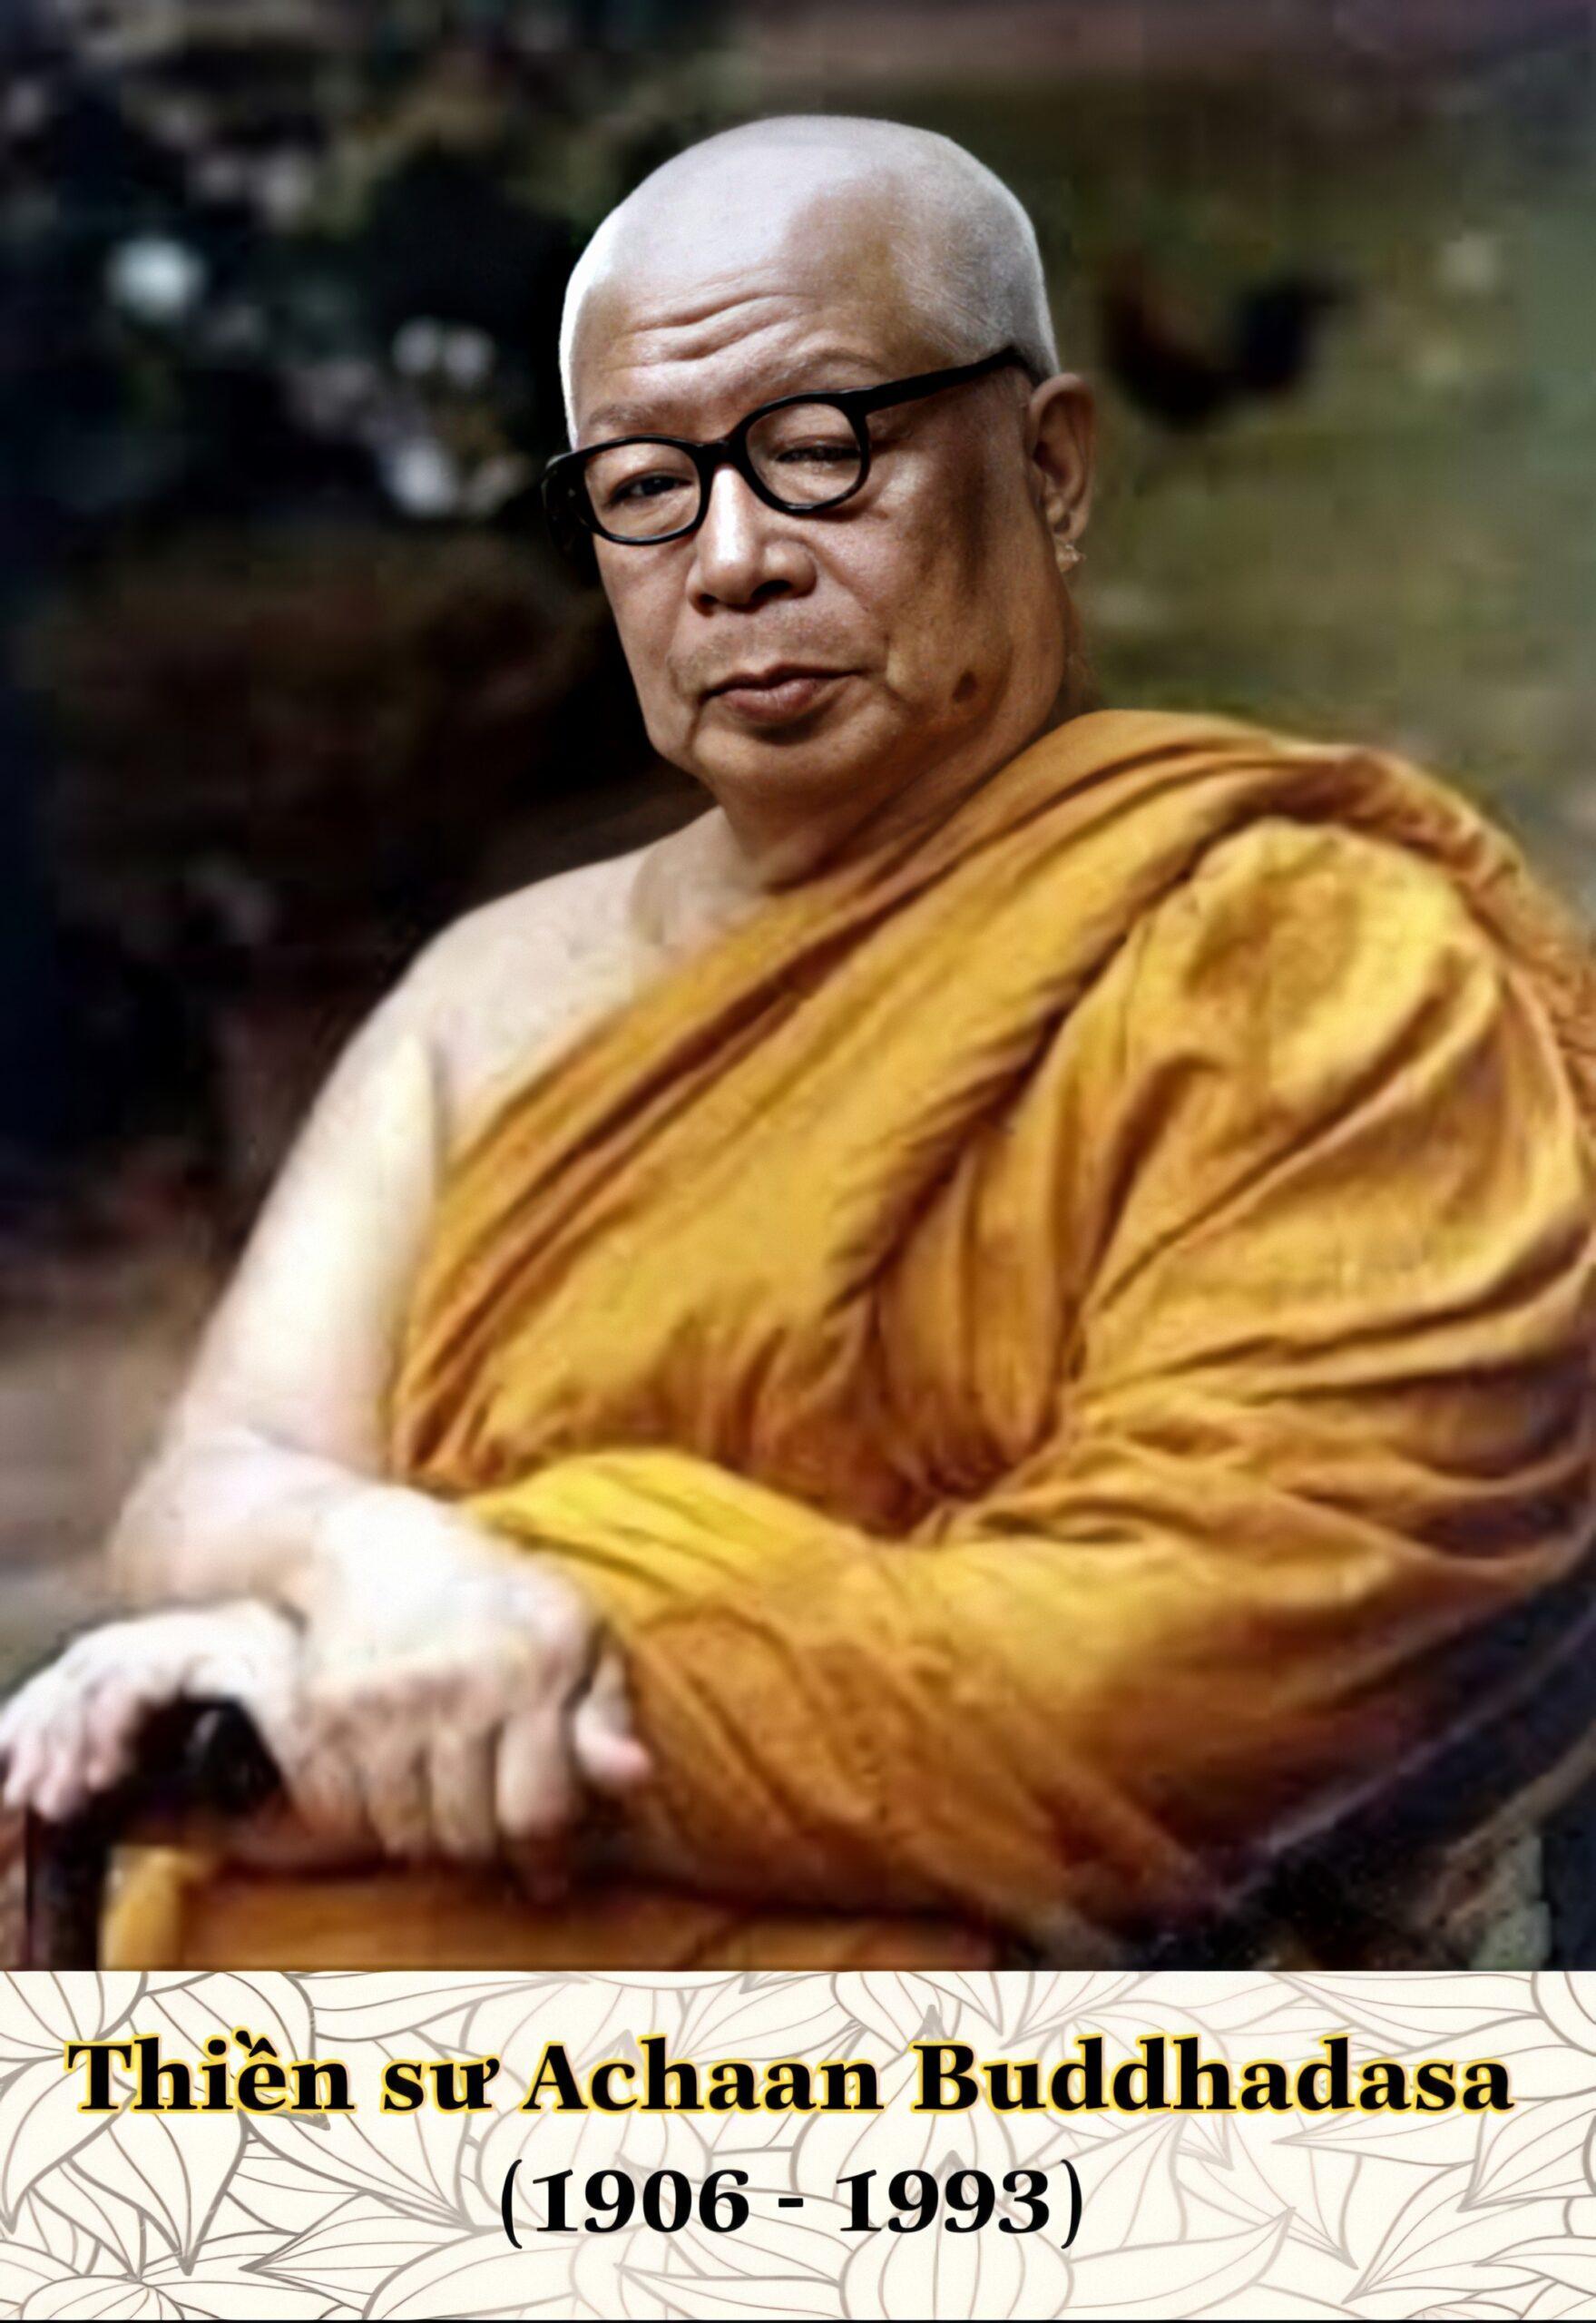 Thiền sư Achaan Buddhadasa 1 scaled